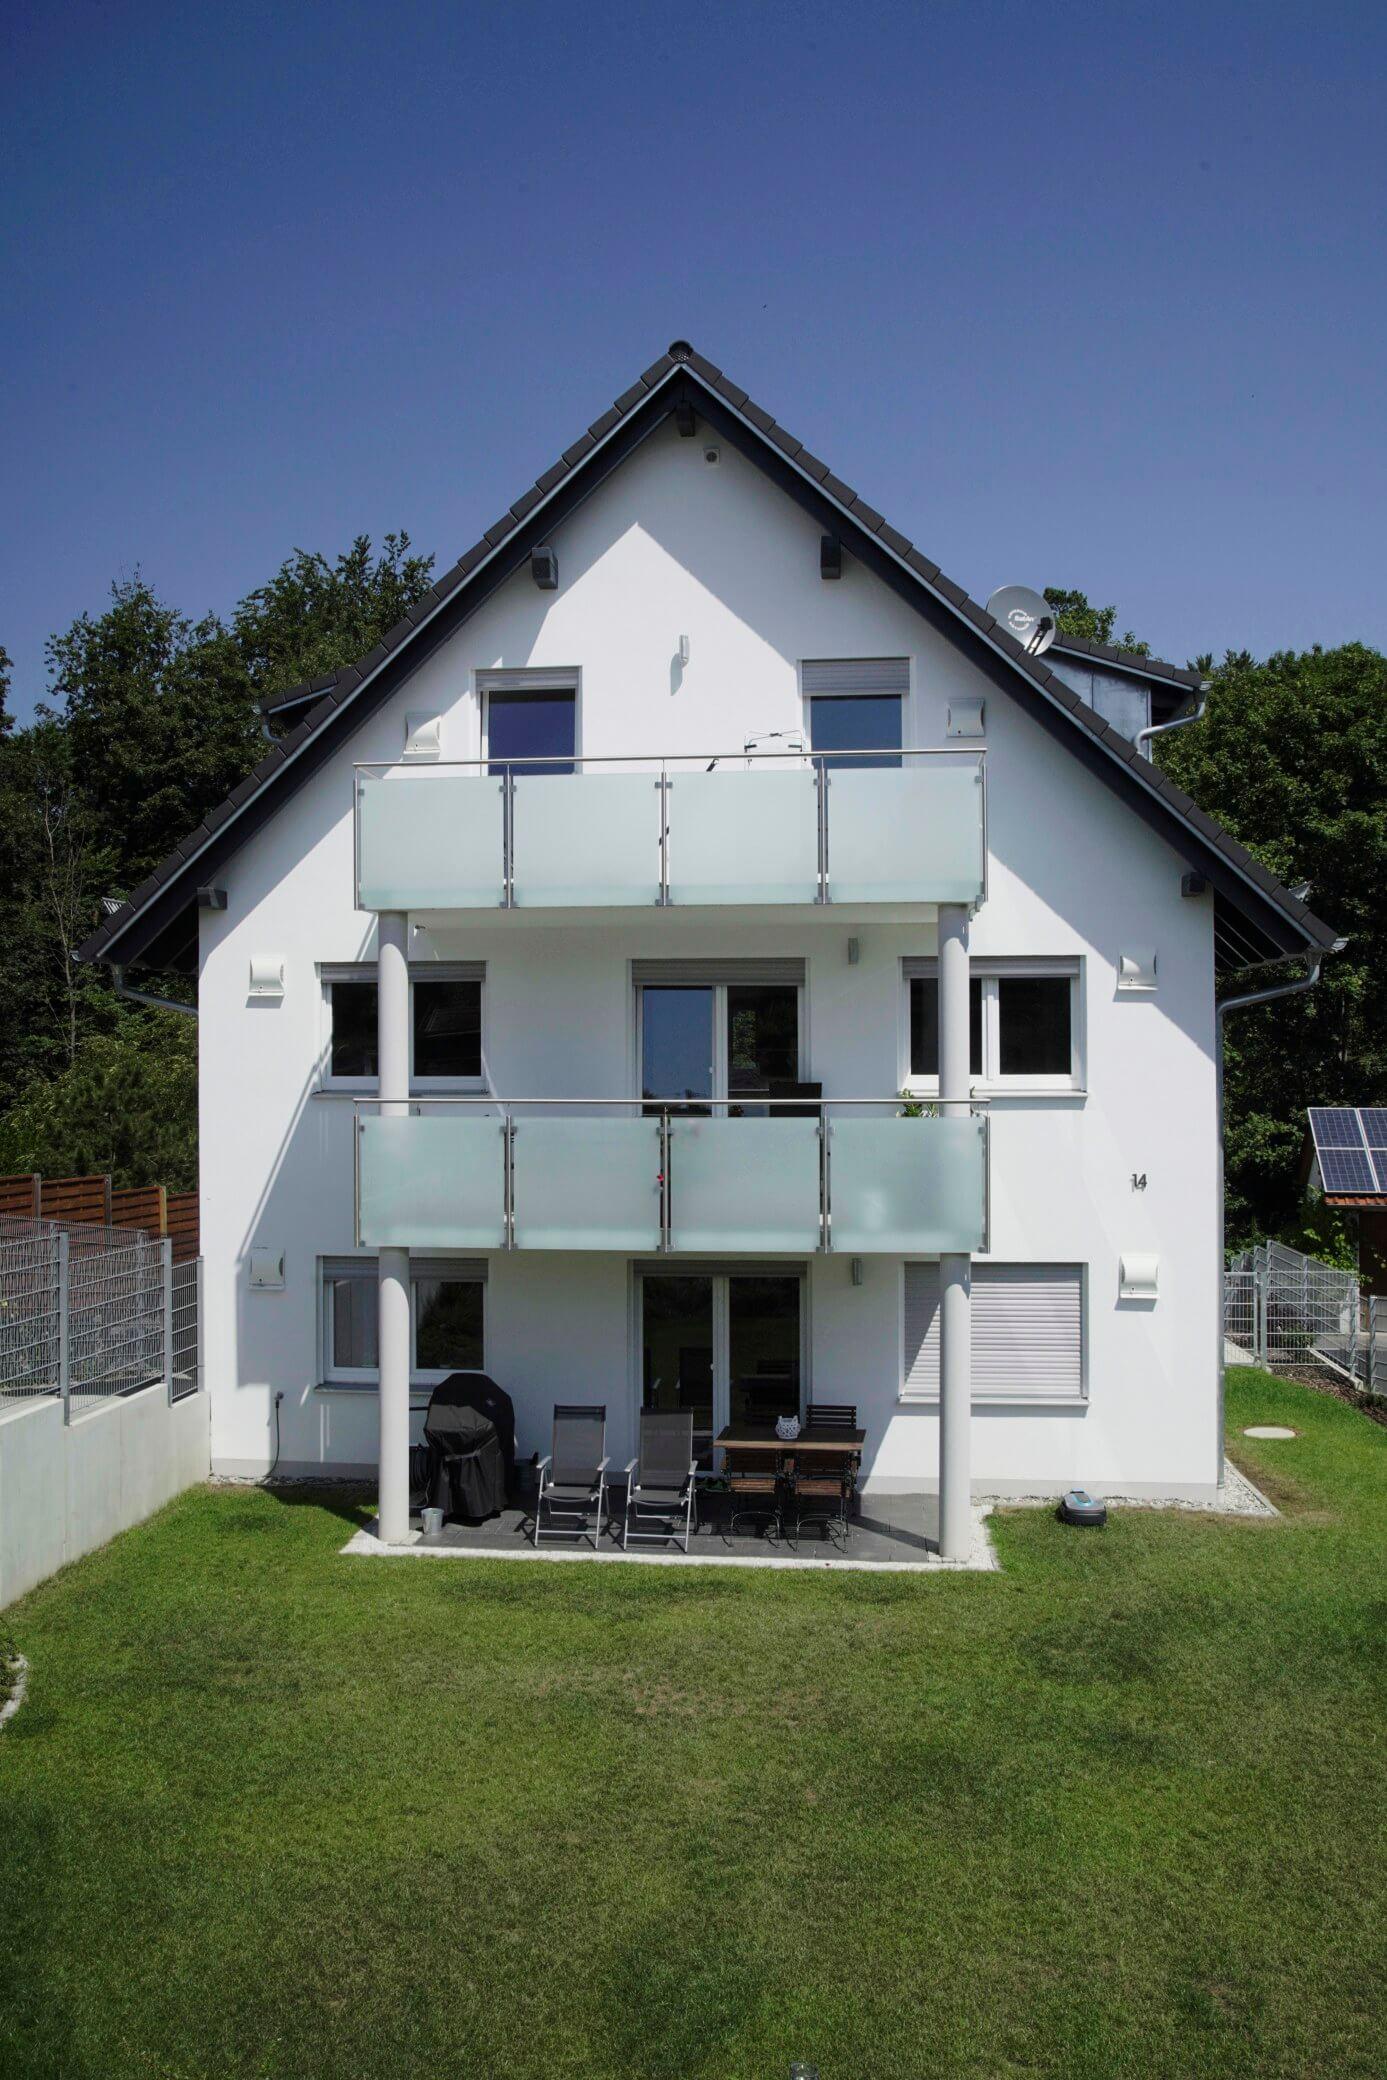 K&K Bau GmbH Massivhaus Referenzbild 7